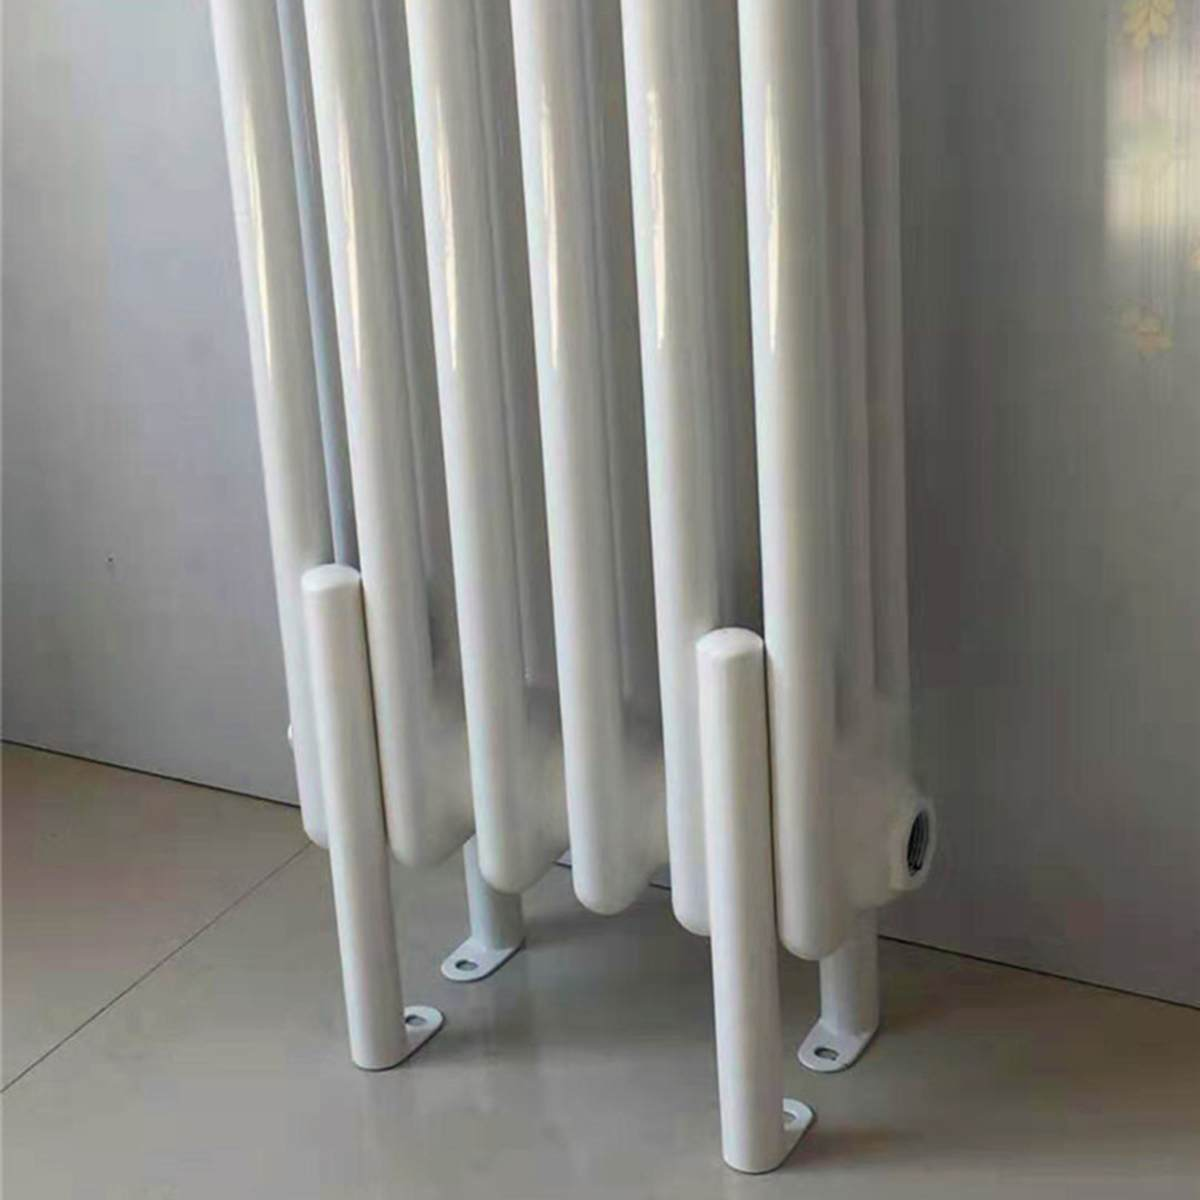 Home Heating Radiator Legs Heating Bracket Heating Pipe Support Wall Heating Panel Heater Water Heating Radiator Feet